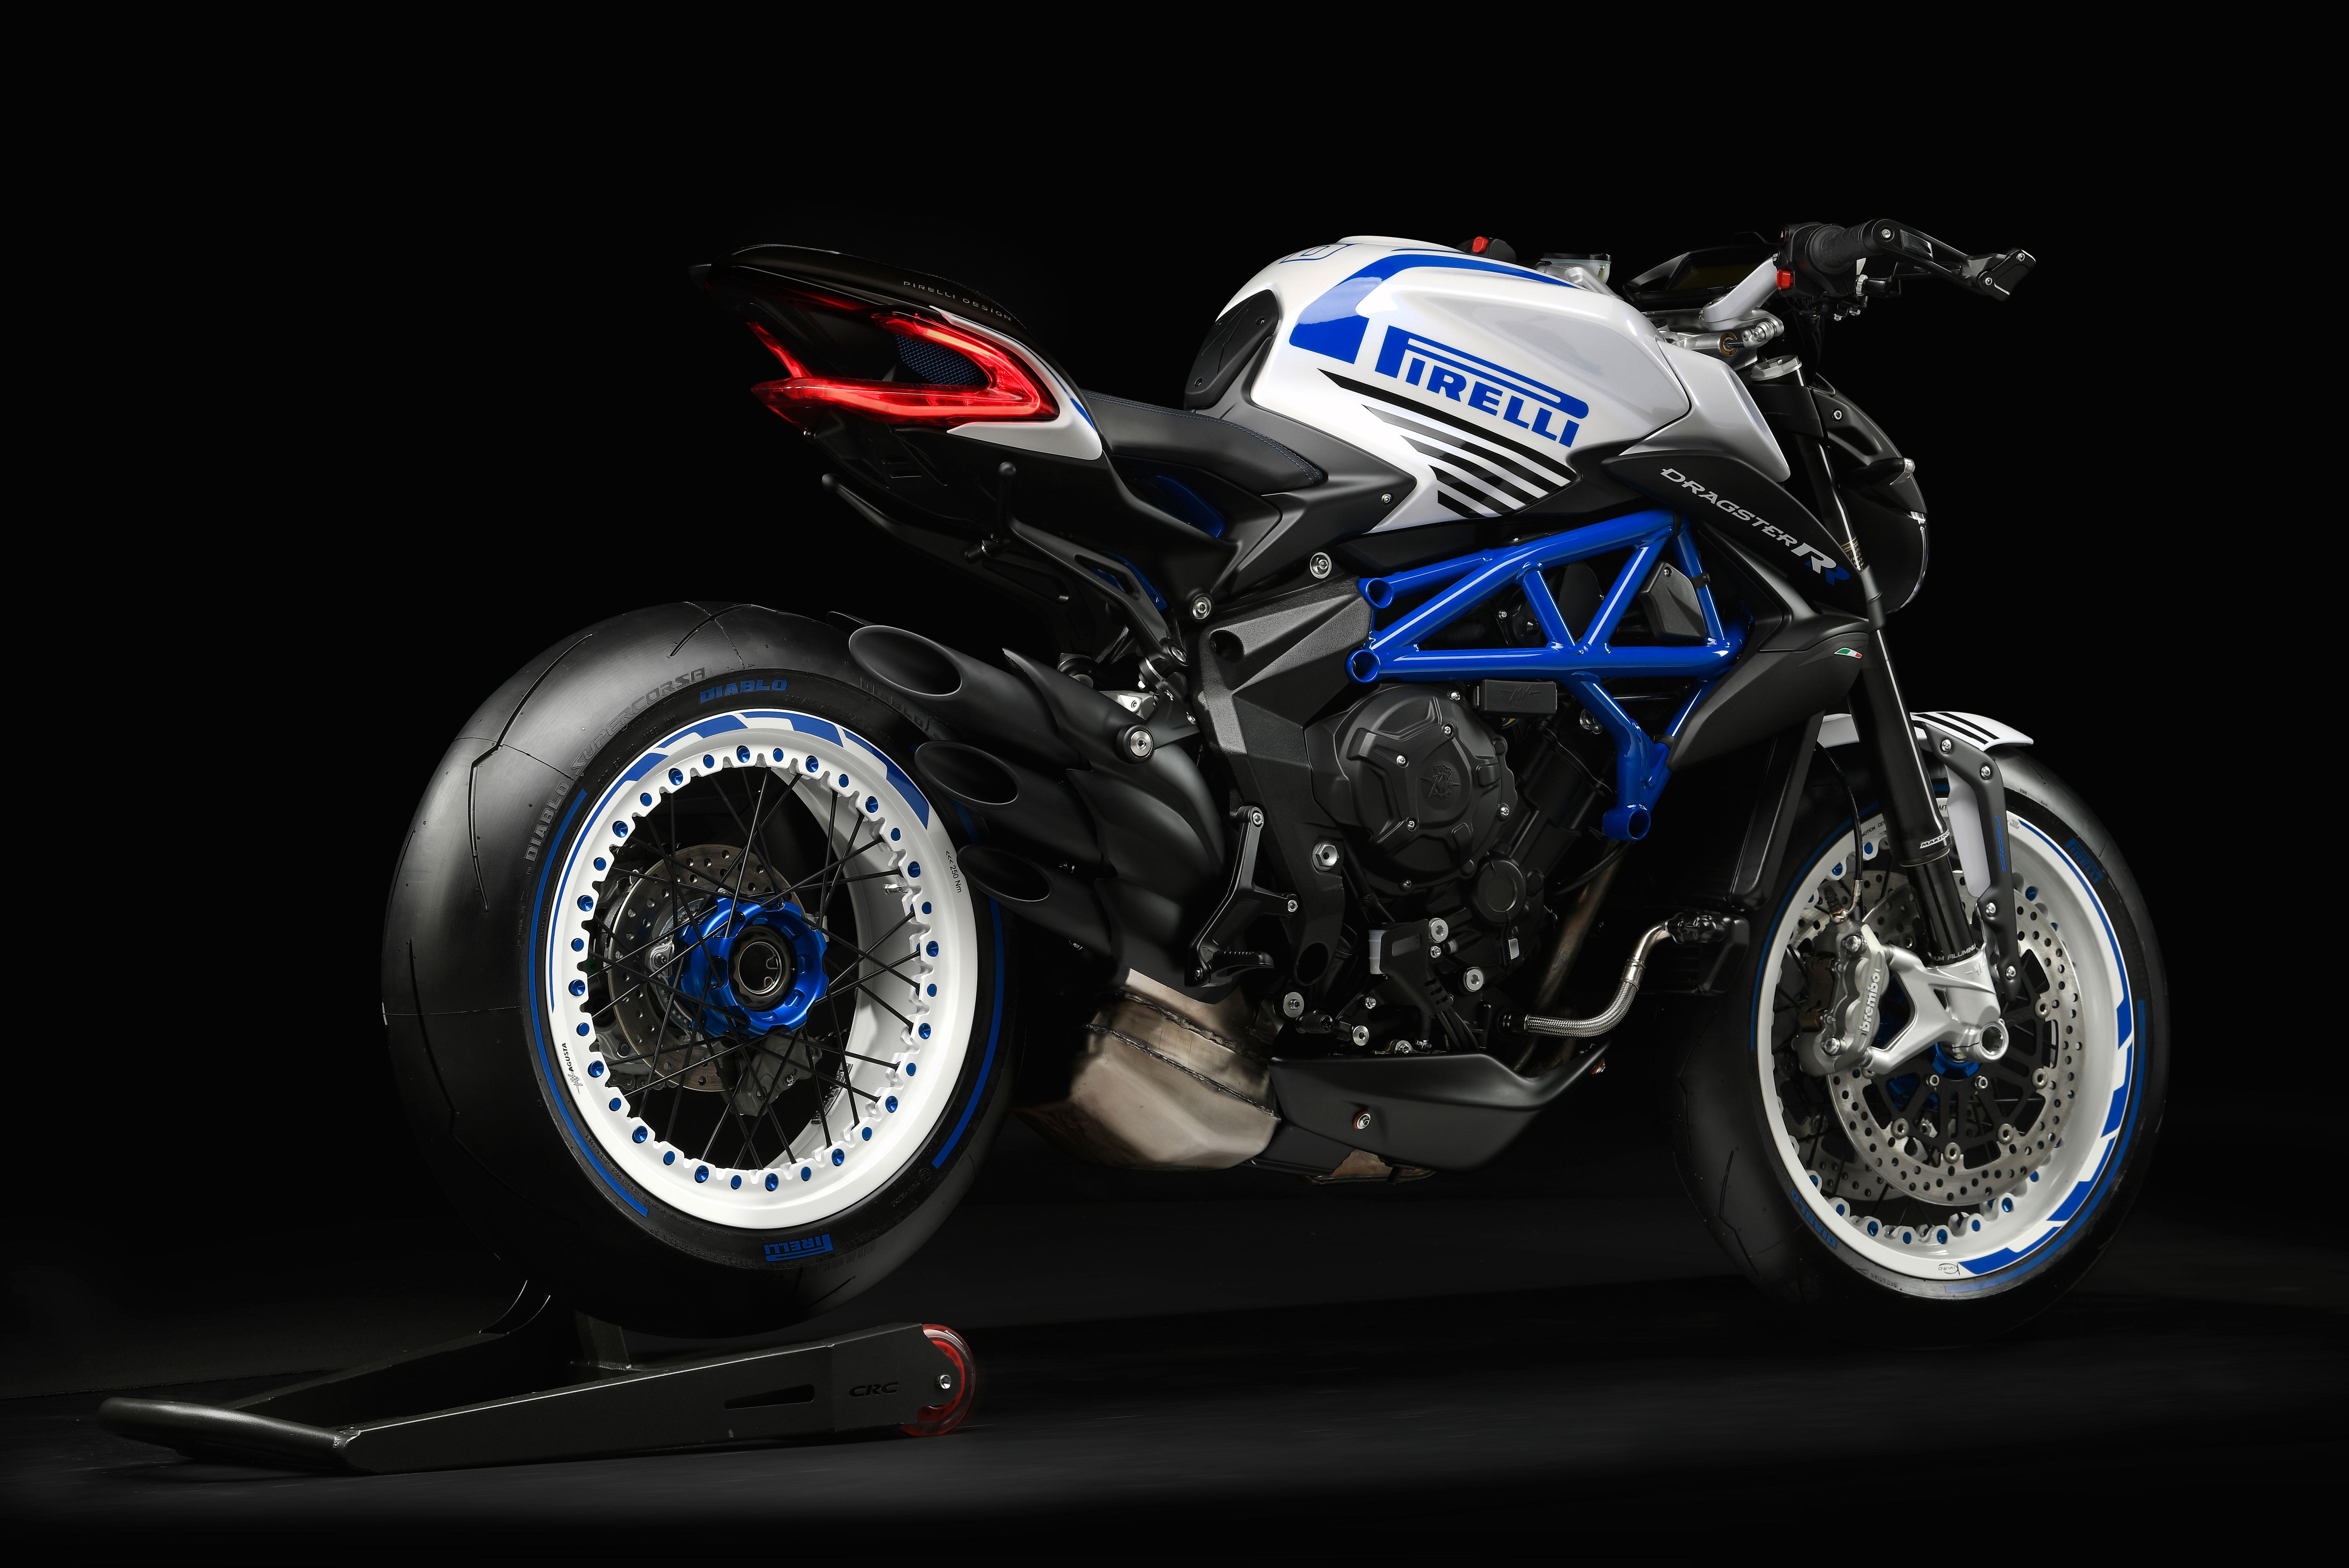 Dragster-800-RR-Pirelli-bllue